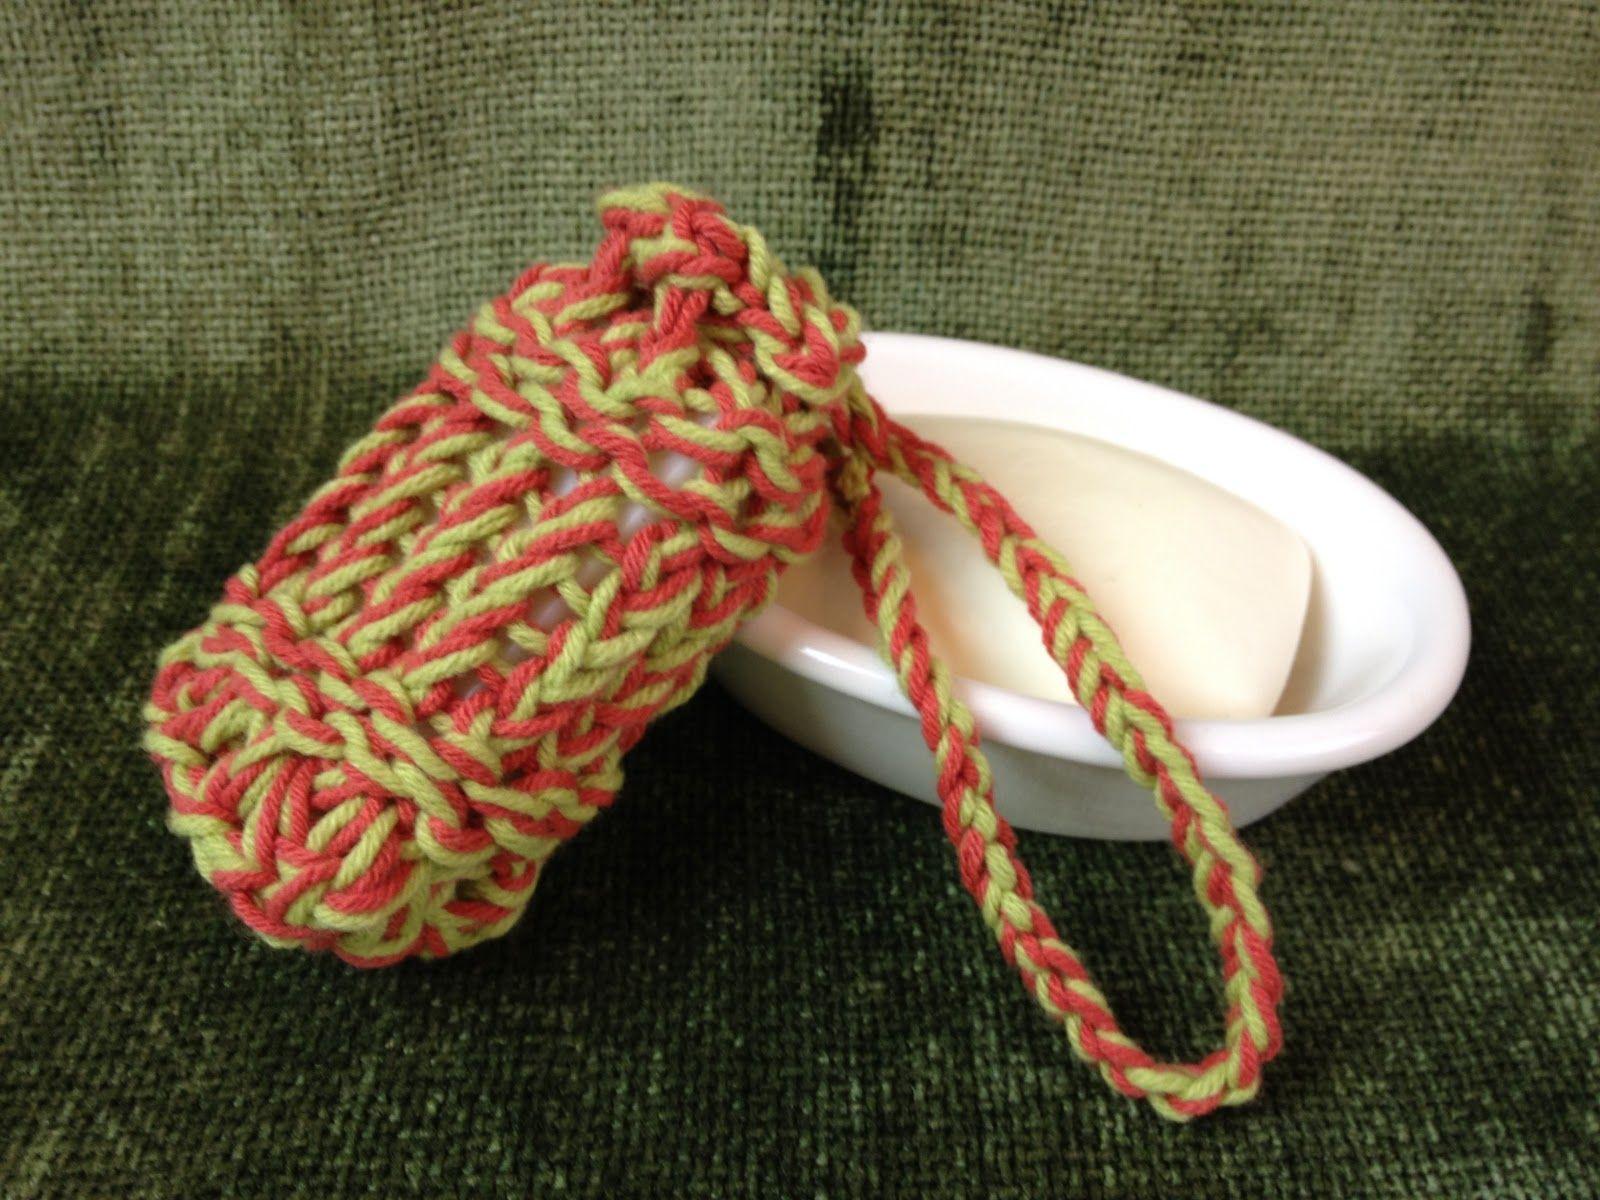 Loom+Knitting+Bag+Pattern | GoodKnit Kisses: FREE PATTERN: Loom Knit Mesh Soap Bag (small ...